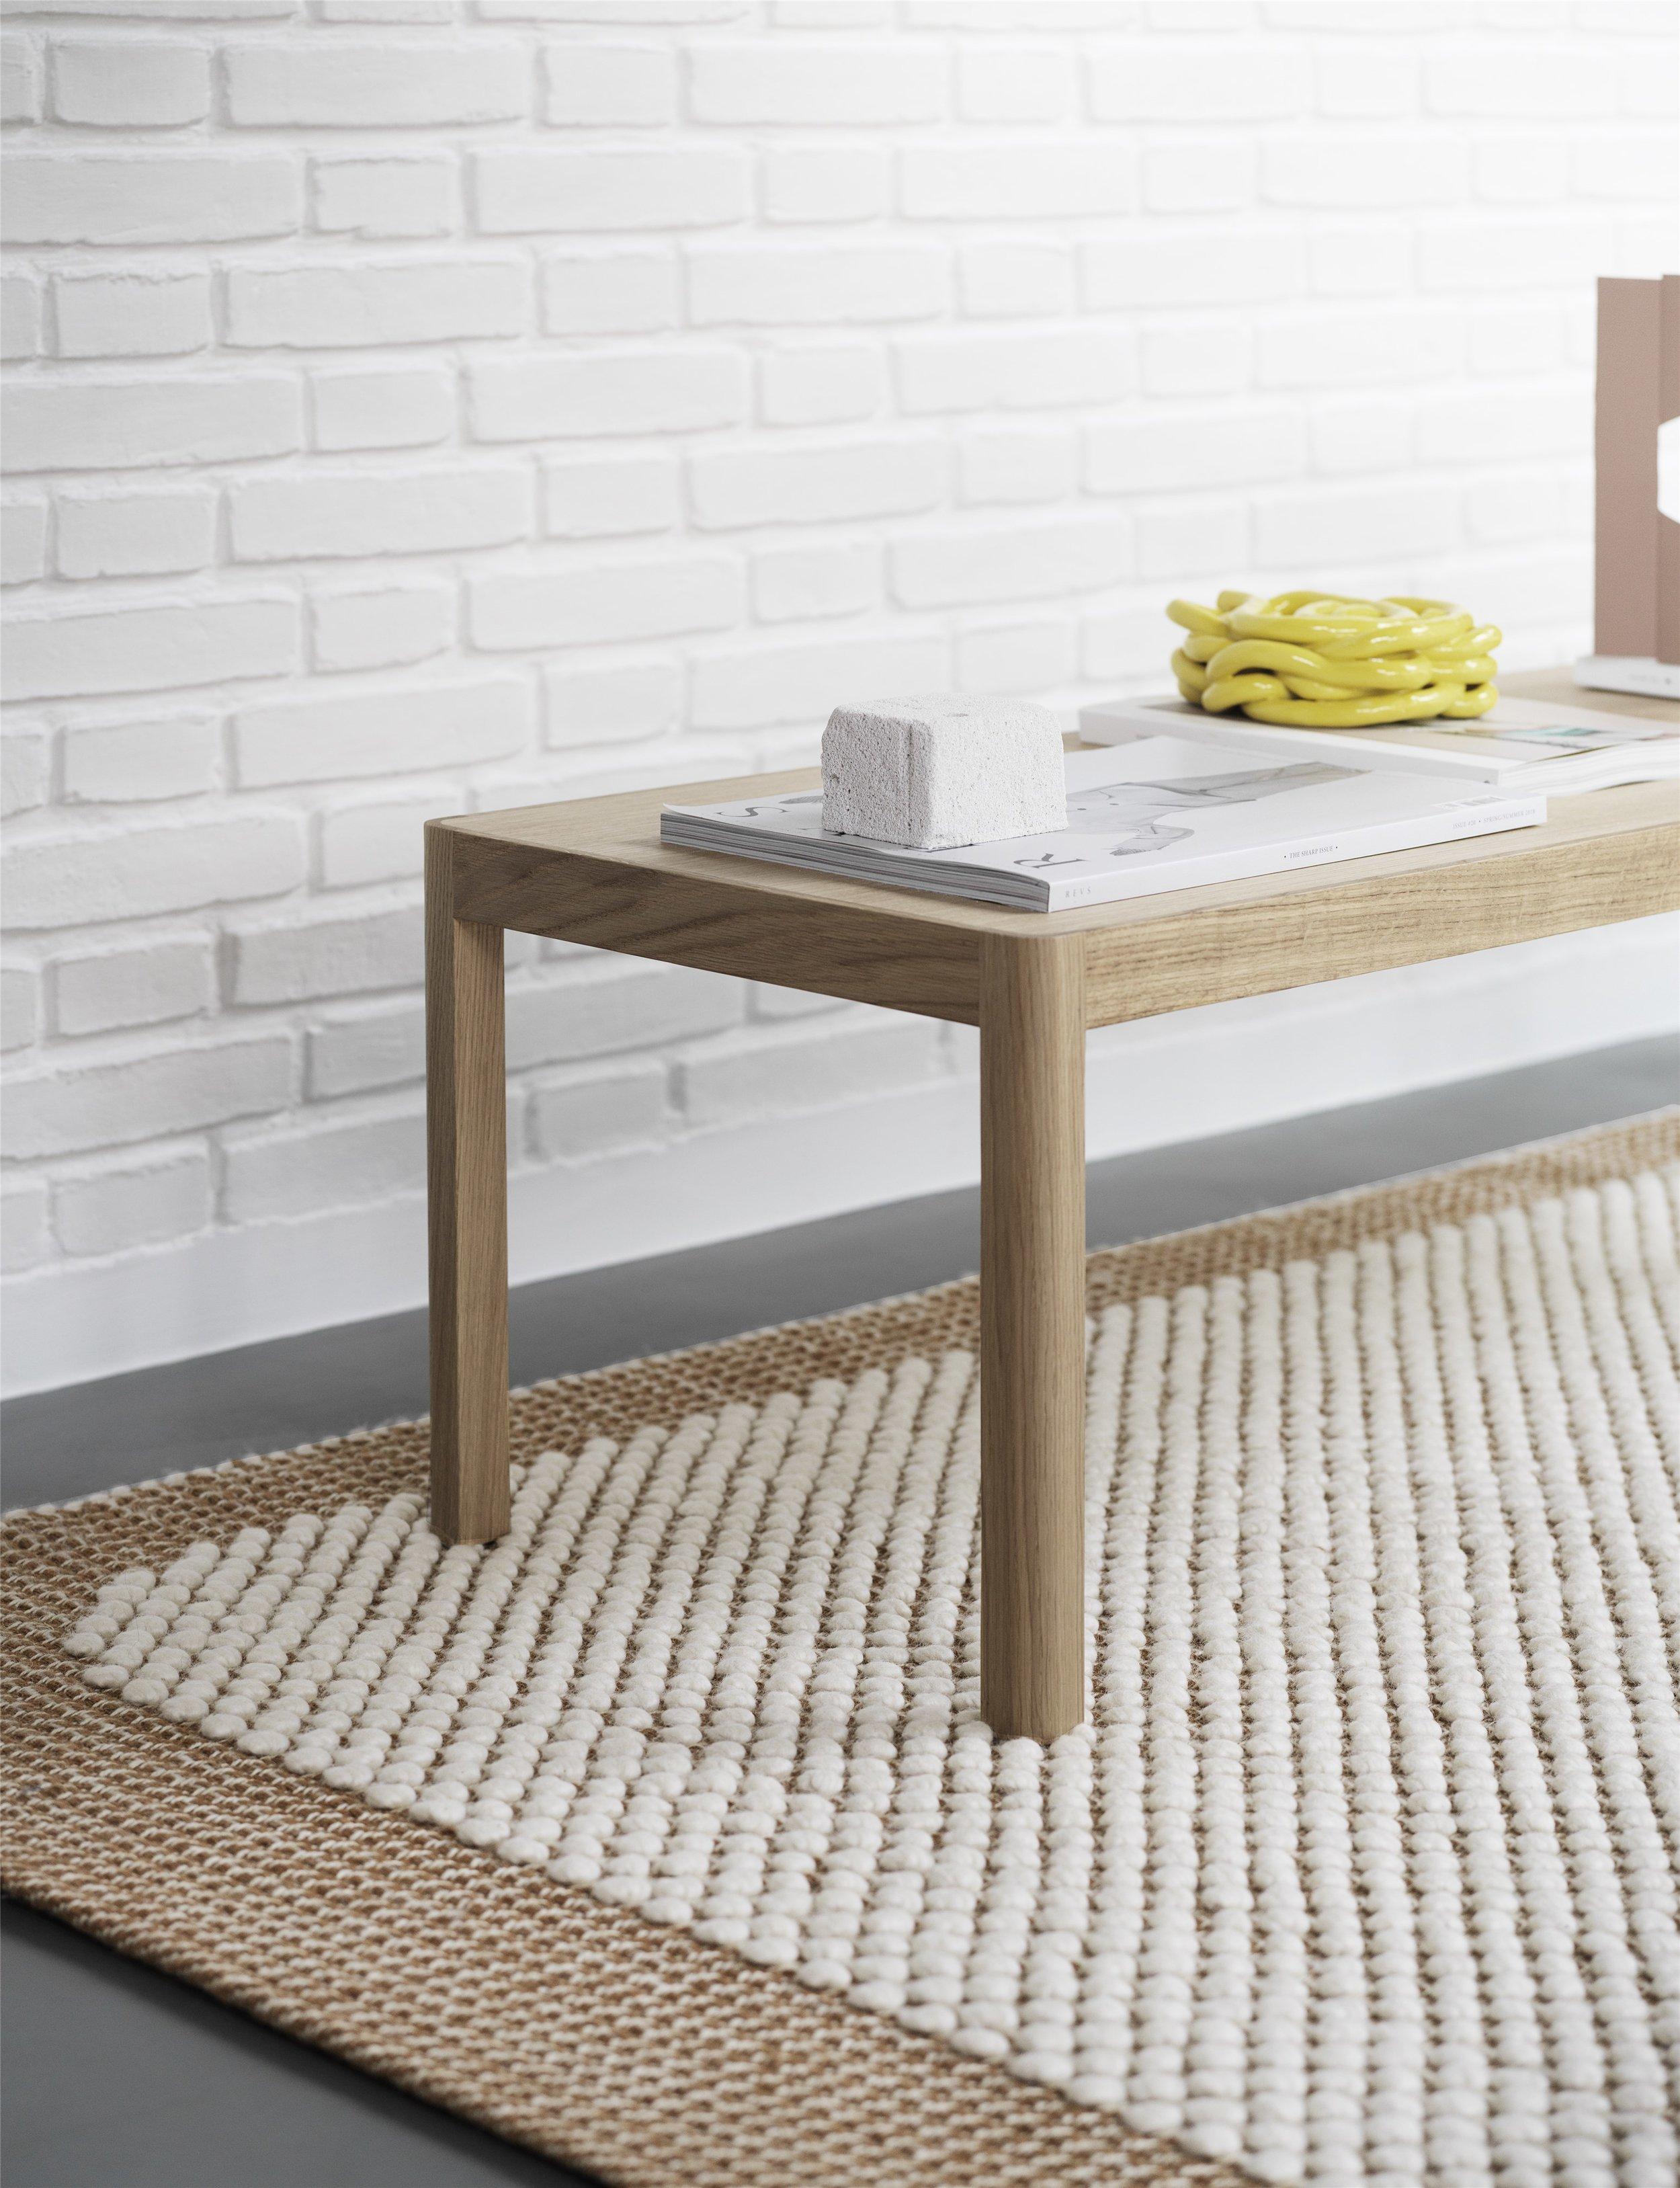 Pebble rug & workshop table  muuto, home decor, accessories, interiors, scandinavian design .jpg